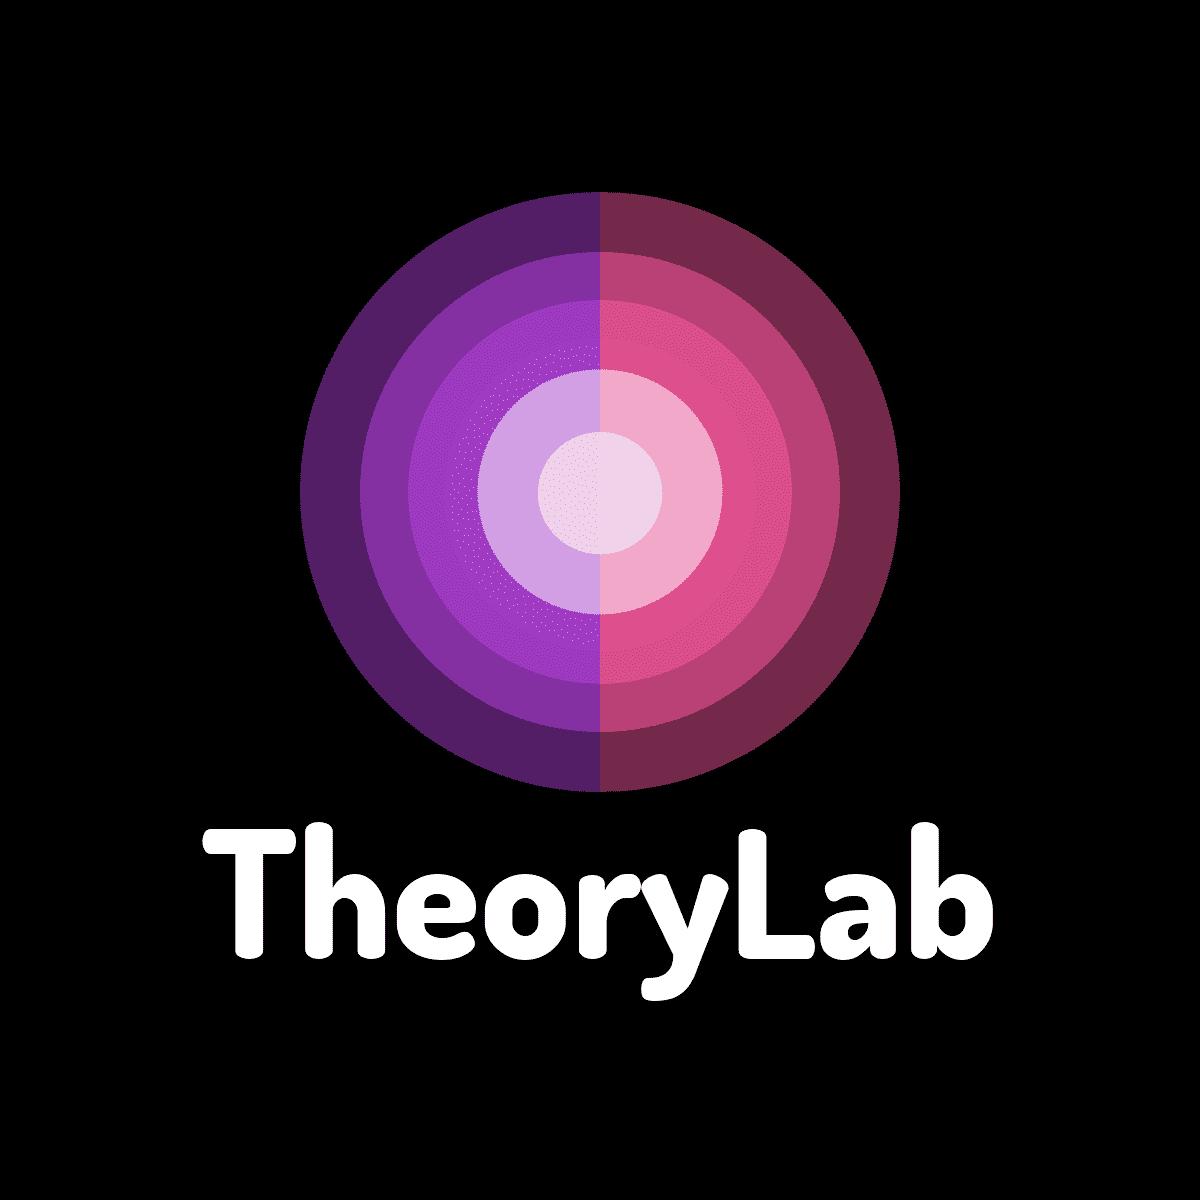 TheoryLab